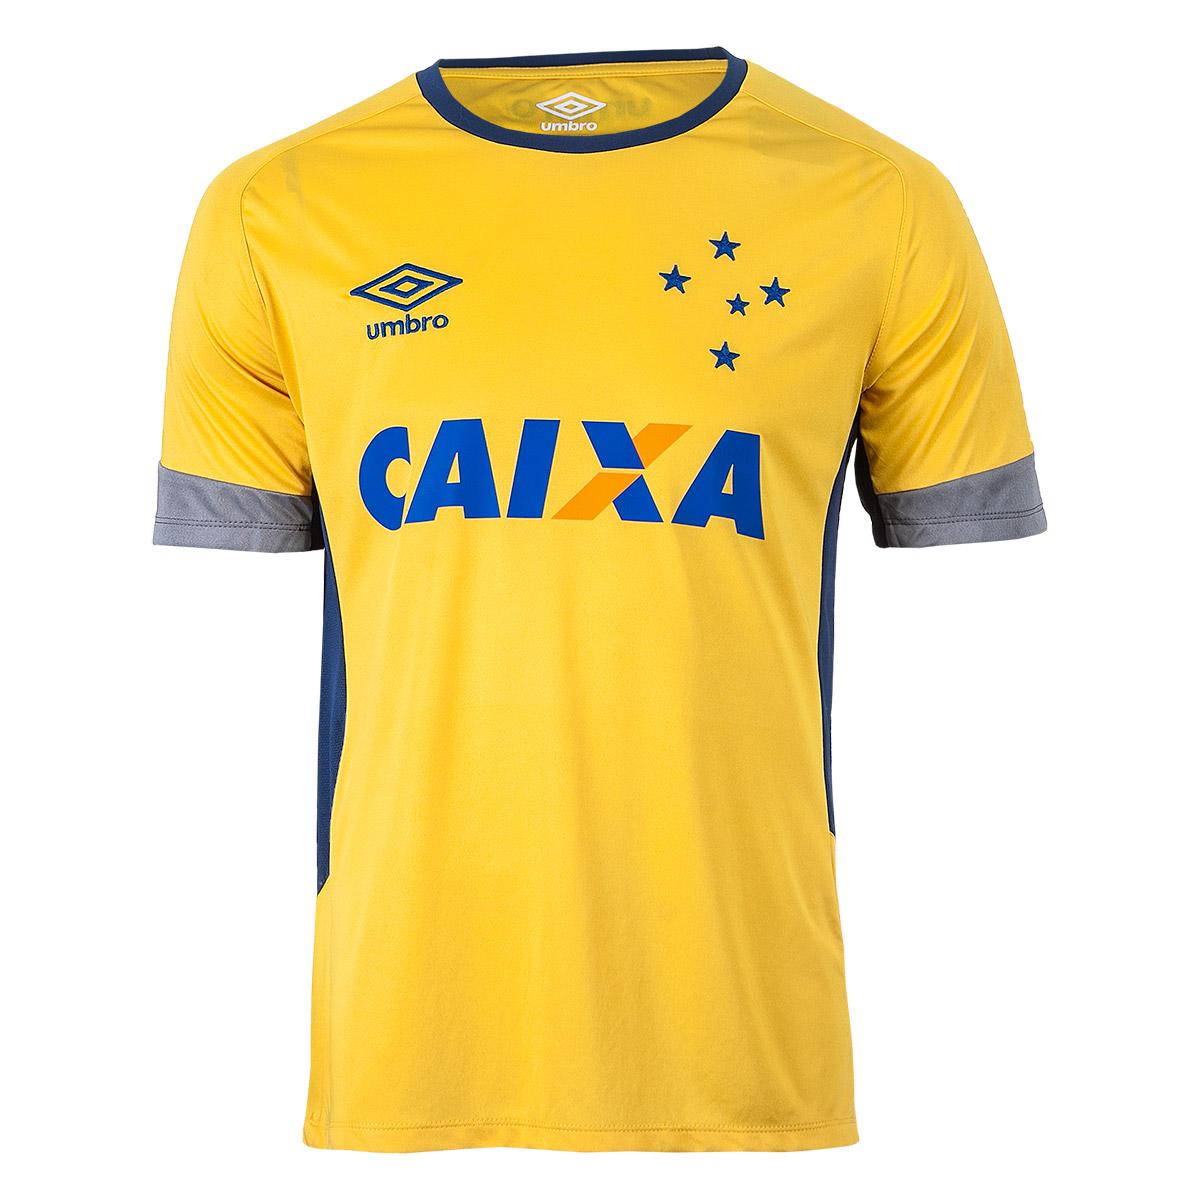 Camiseta Masc. Umbro Cruzeiro Treino 2016 - Amarelo/Cinza